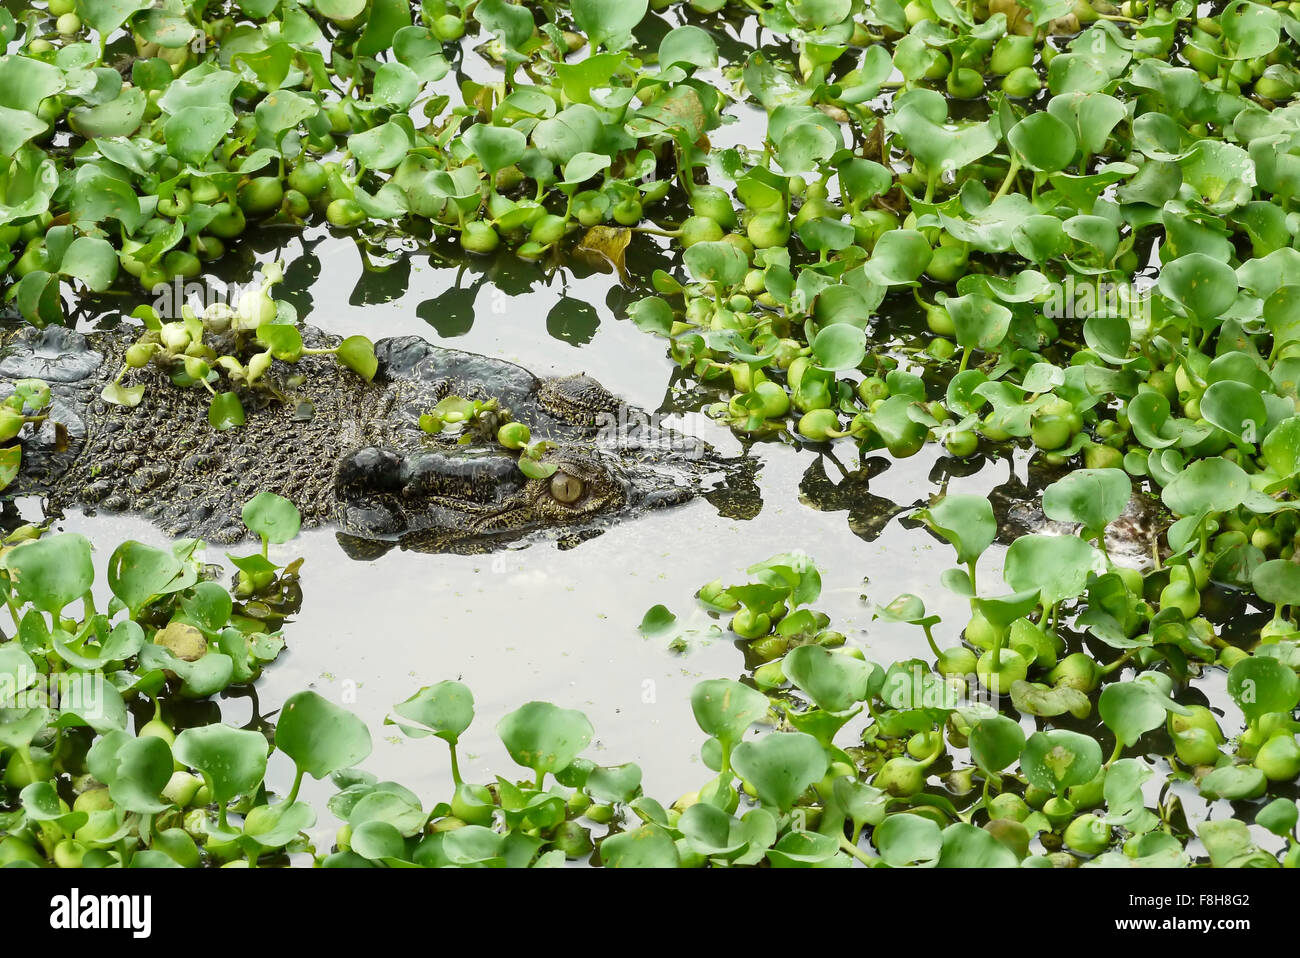 Portrait of an Estuarine Crocodile - Stock Image